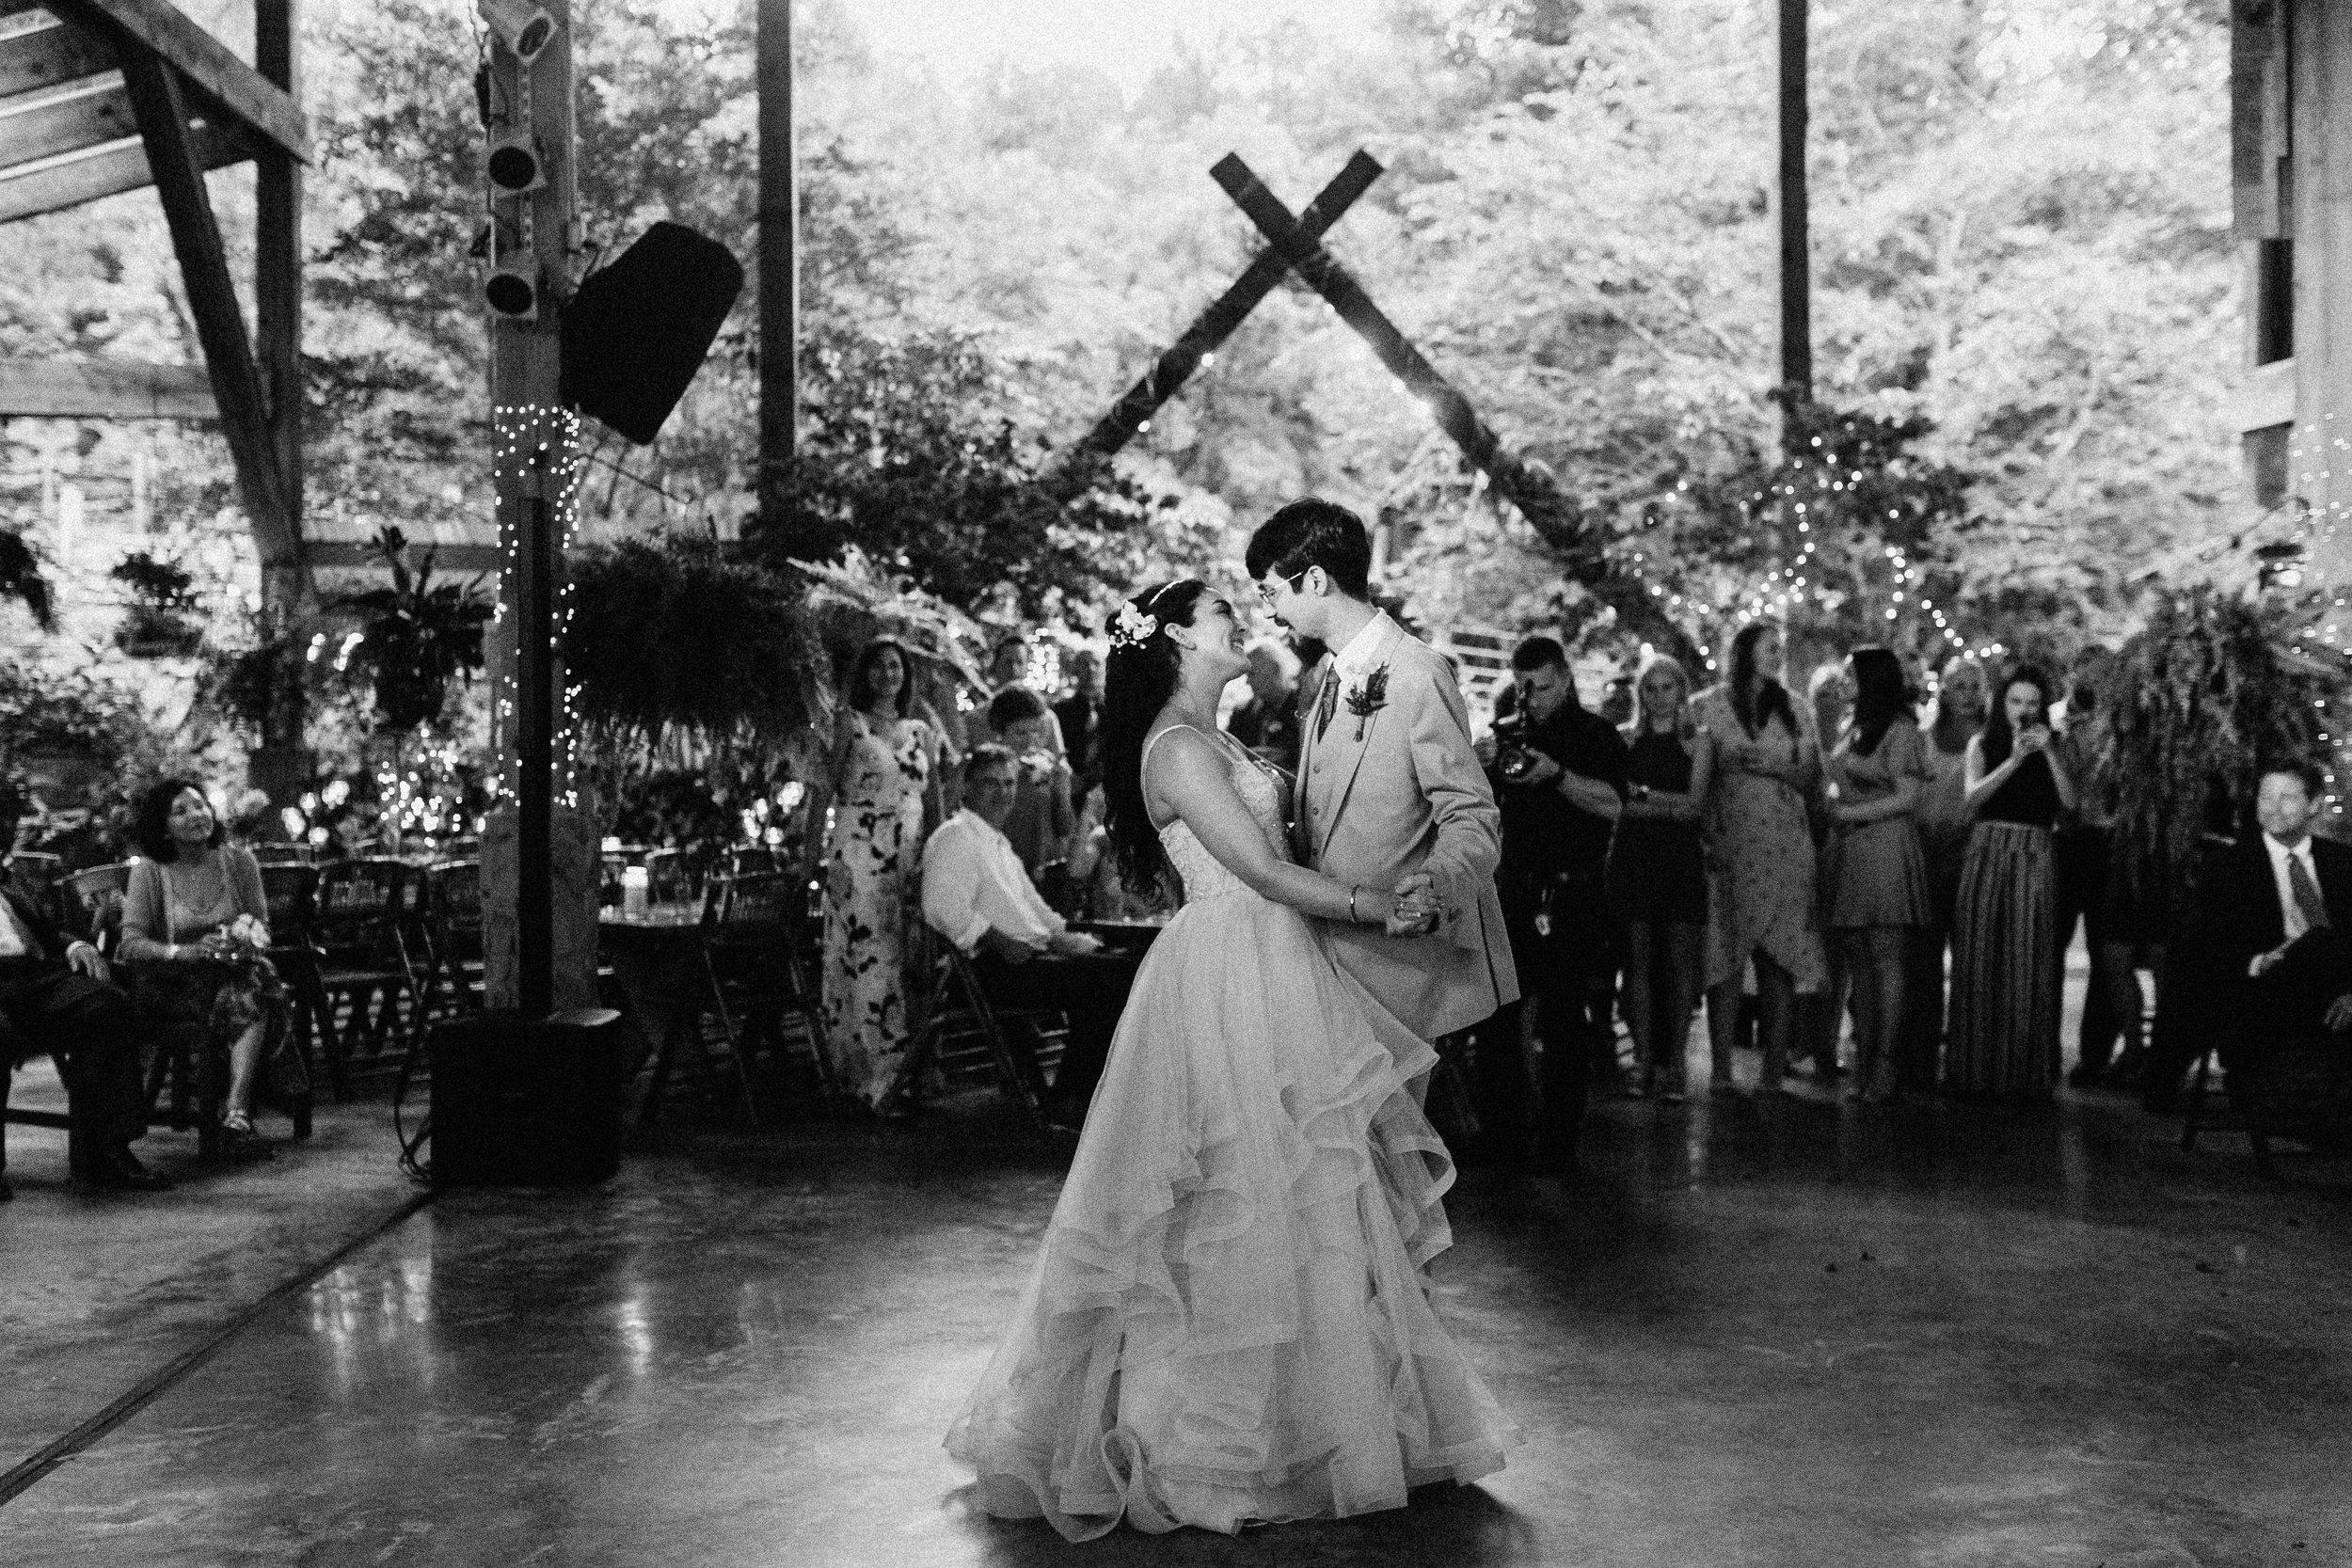 neverland_farms_atlanta_wedding_photographer_documentary_river_west_2183.jpg